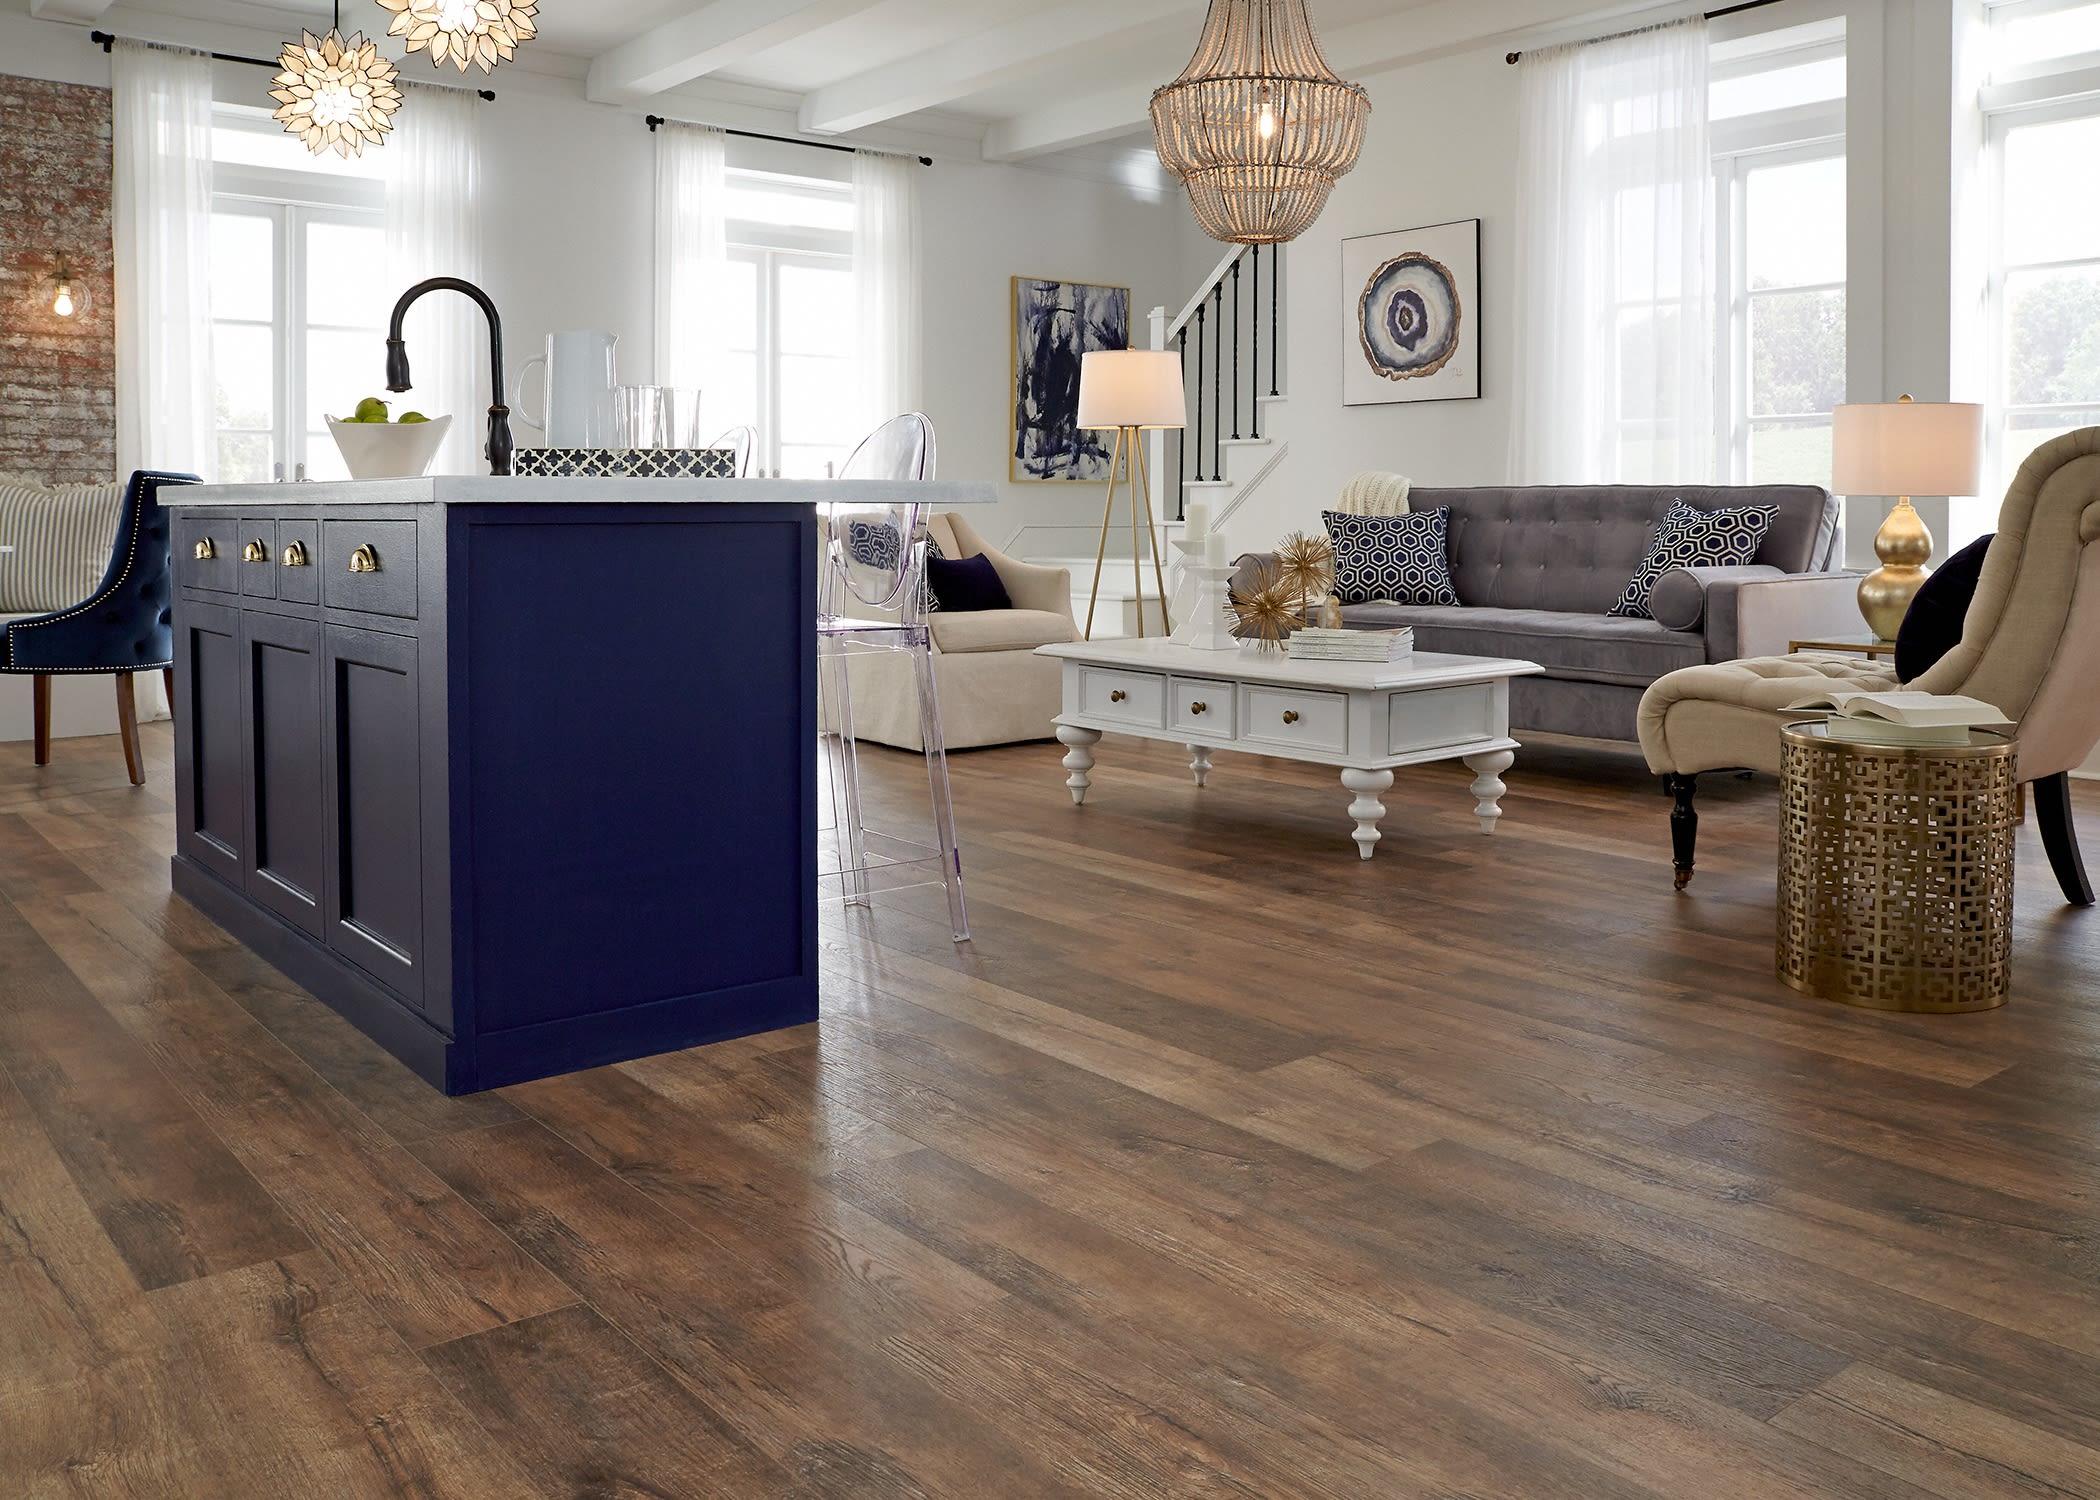 Laminate Flooring Wood Floors, Installing Laminate Flooring Lumber Liquidators